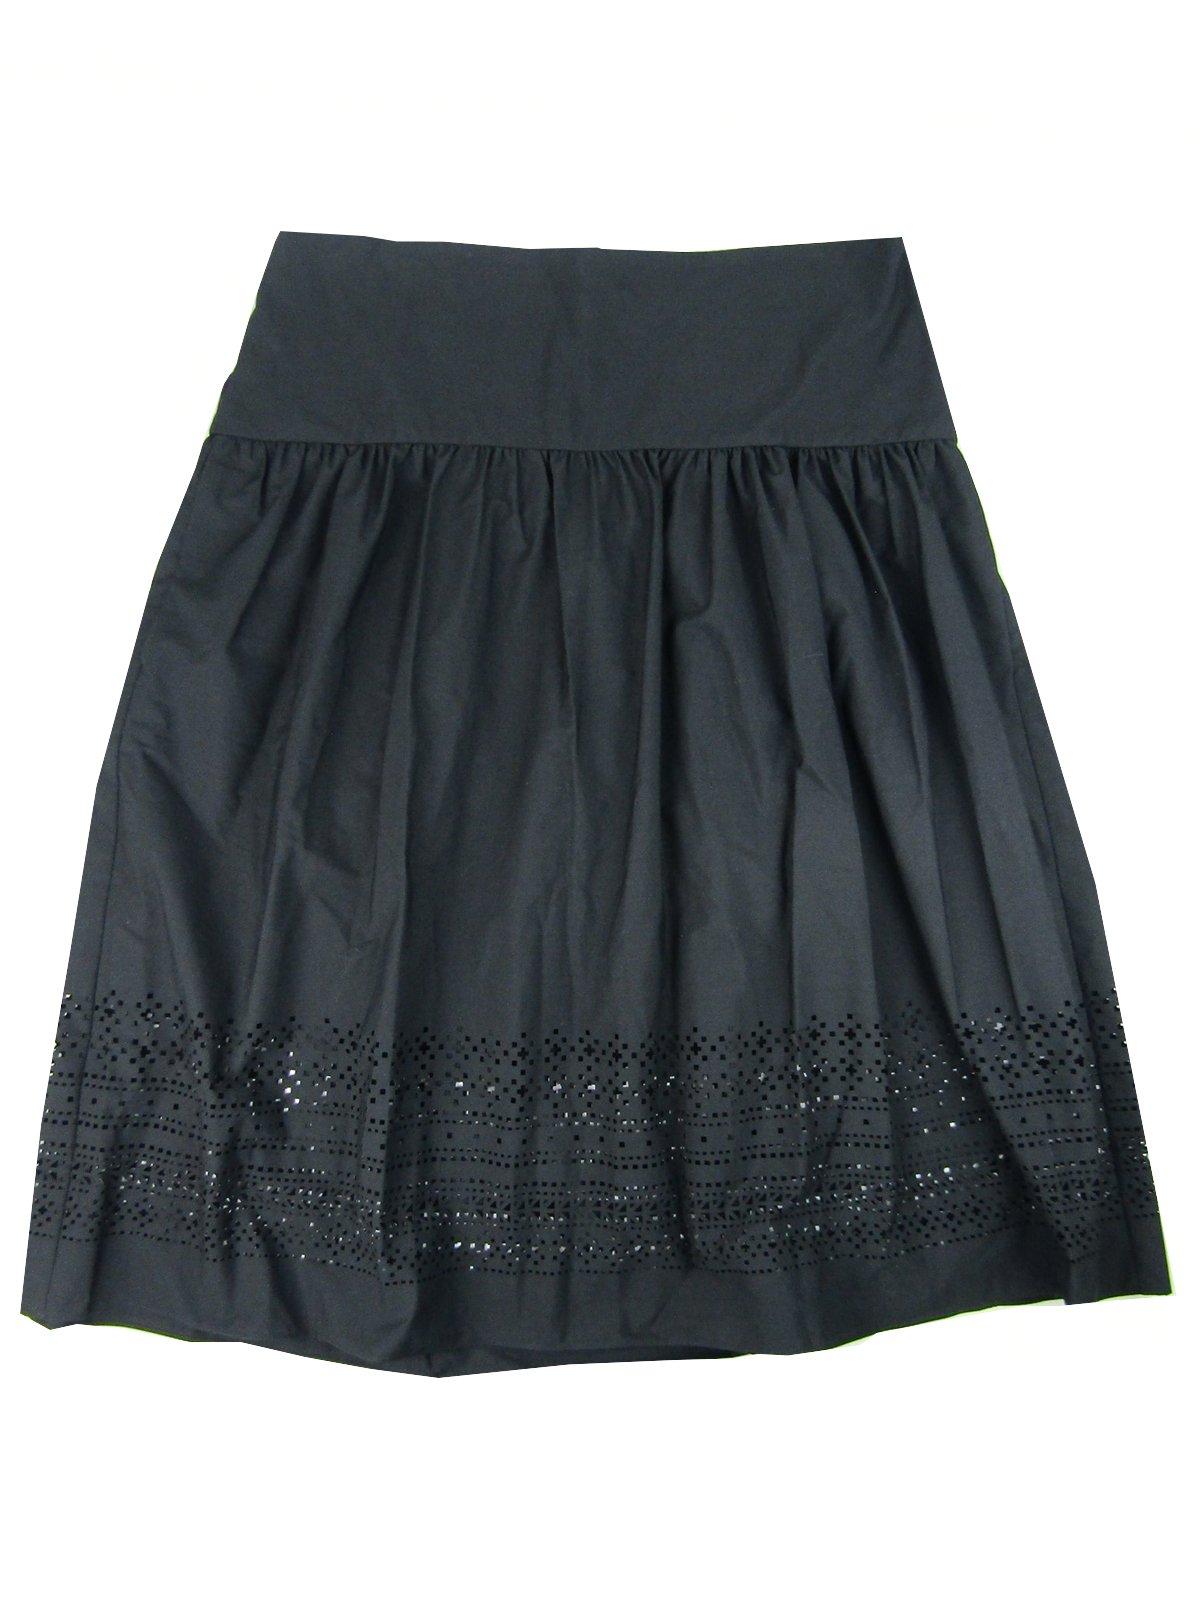 Lauren by Ralph Lauren Women's Laser Cut Poplin Skirt (12, Polo Black)